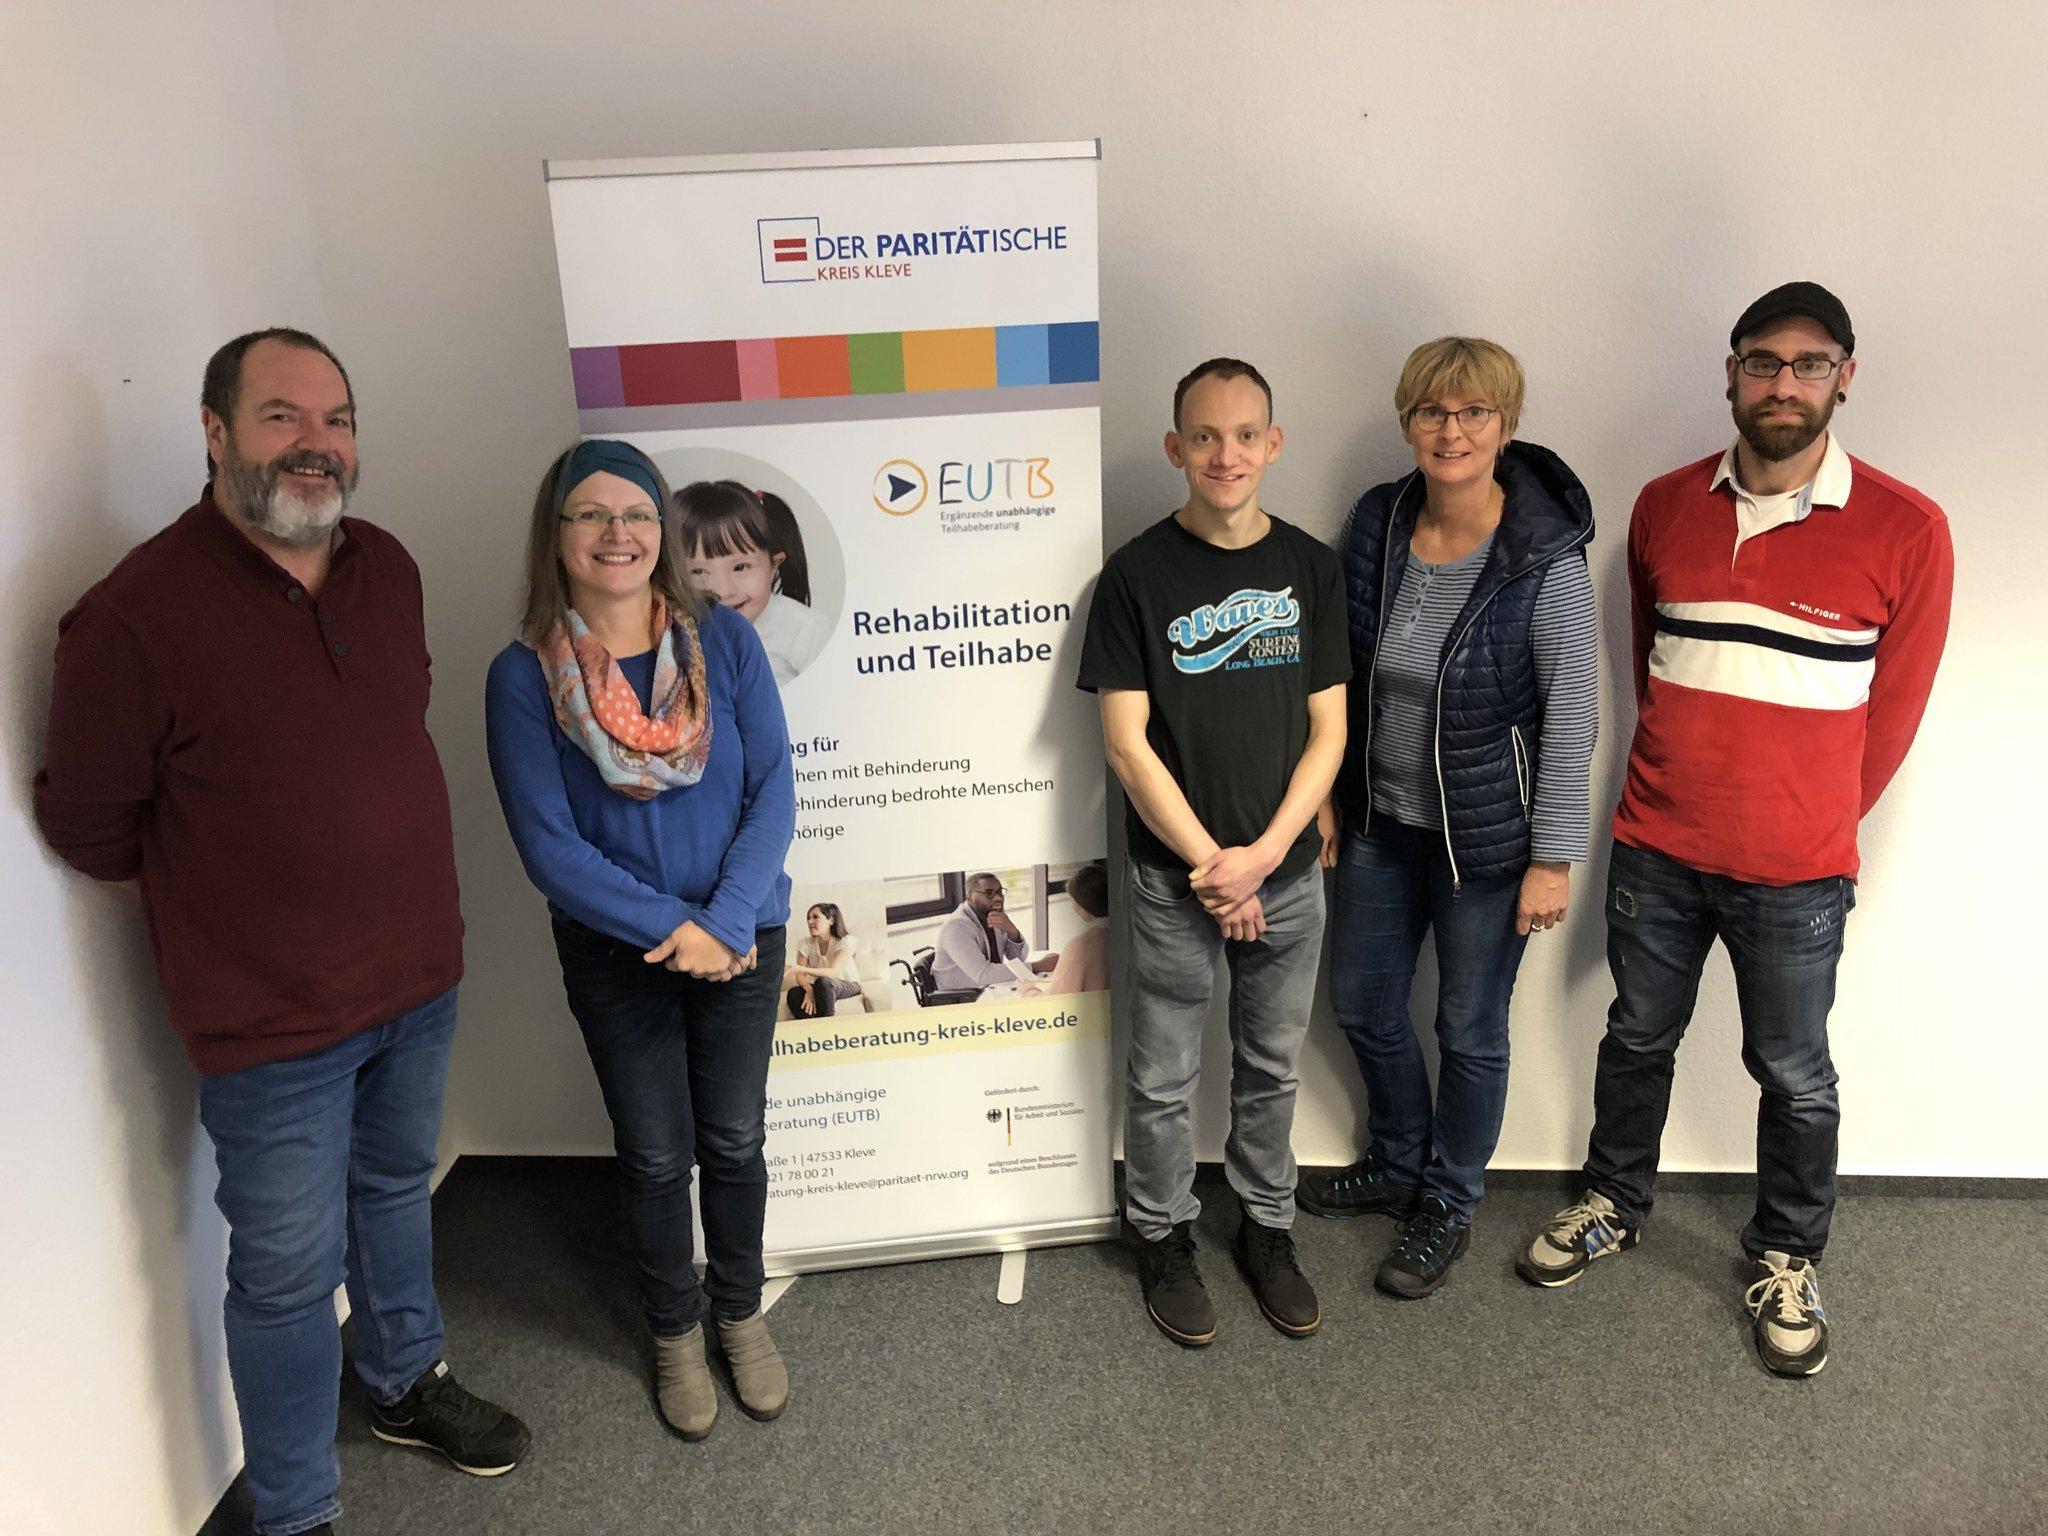 Peer-Beratung in der Ergänzenden unabhängigen Teilhabeberatung (EUTB) Kreis Kleve: Betroffene beraten Betroffene - Kleve - Lokalkompass.de